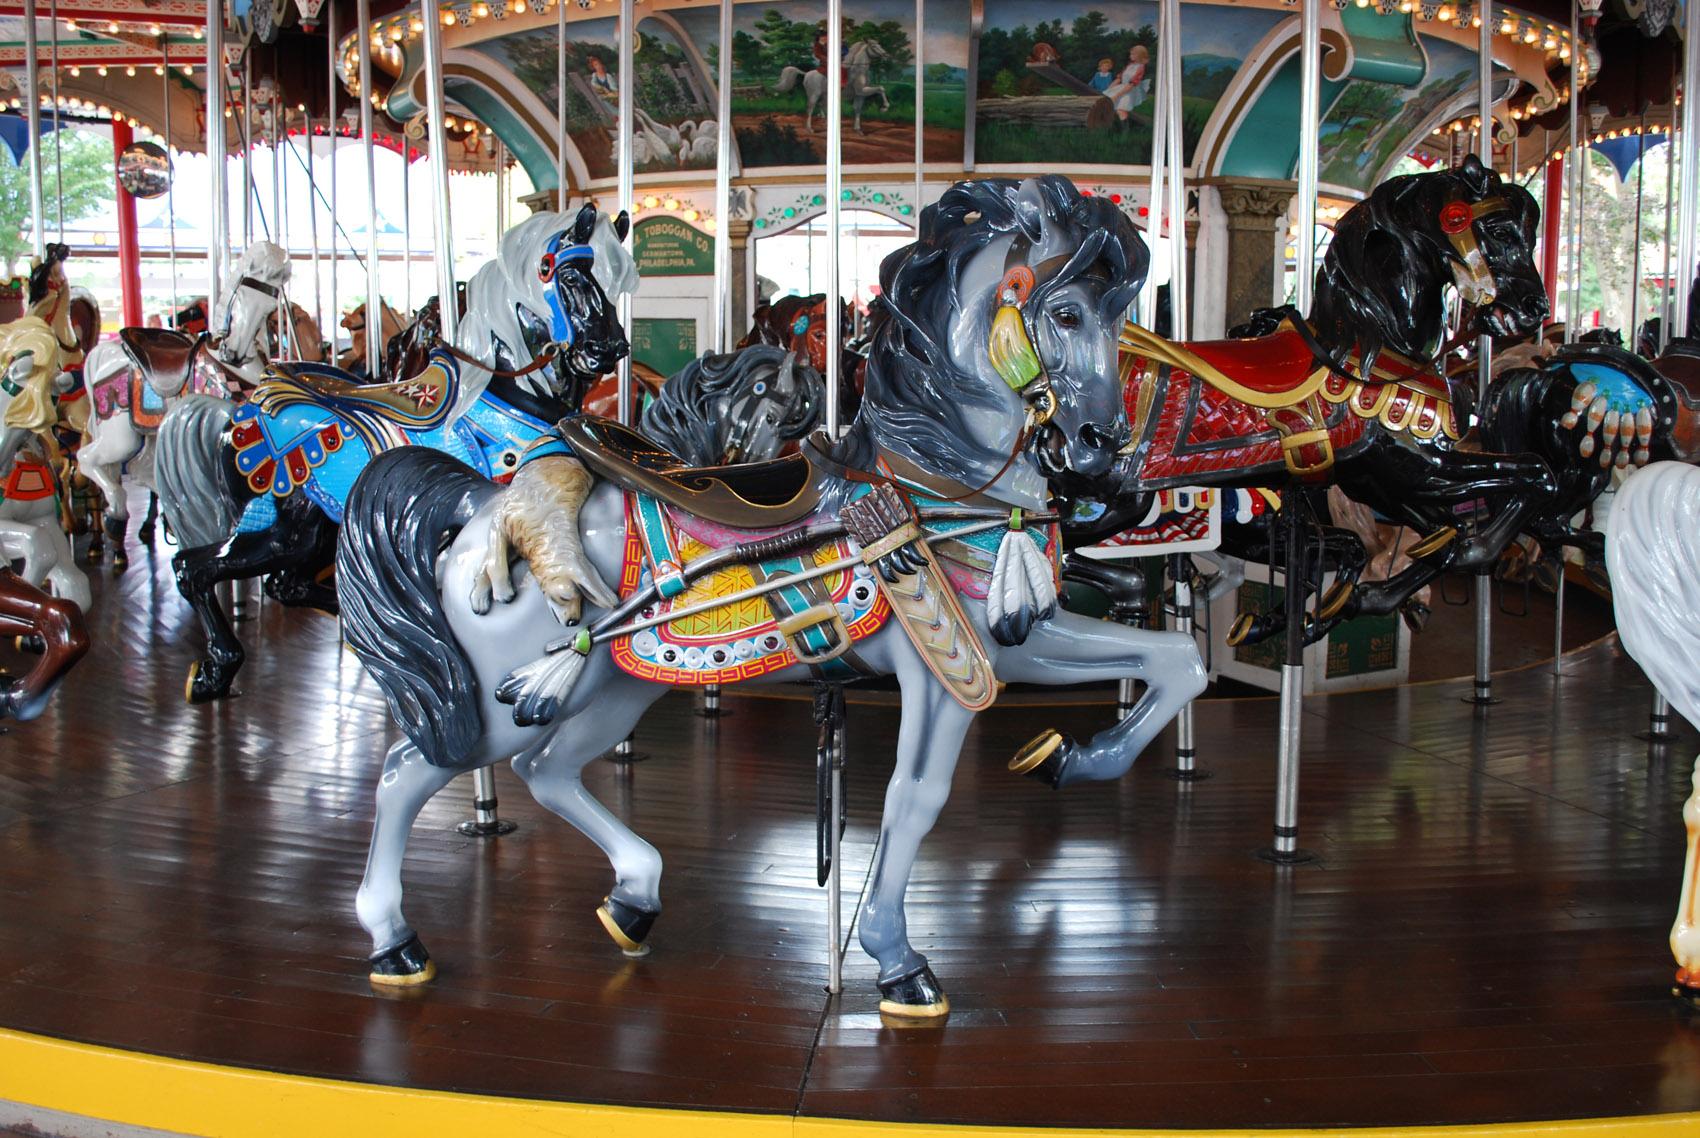 Historic-1919-Hersheypark-PTC-47-carousel-horse-0310